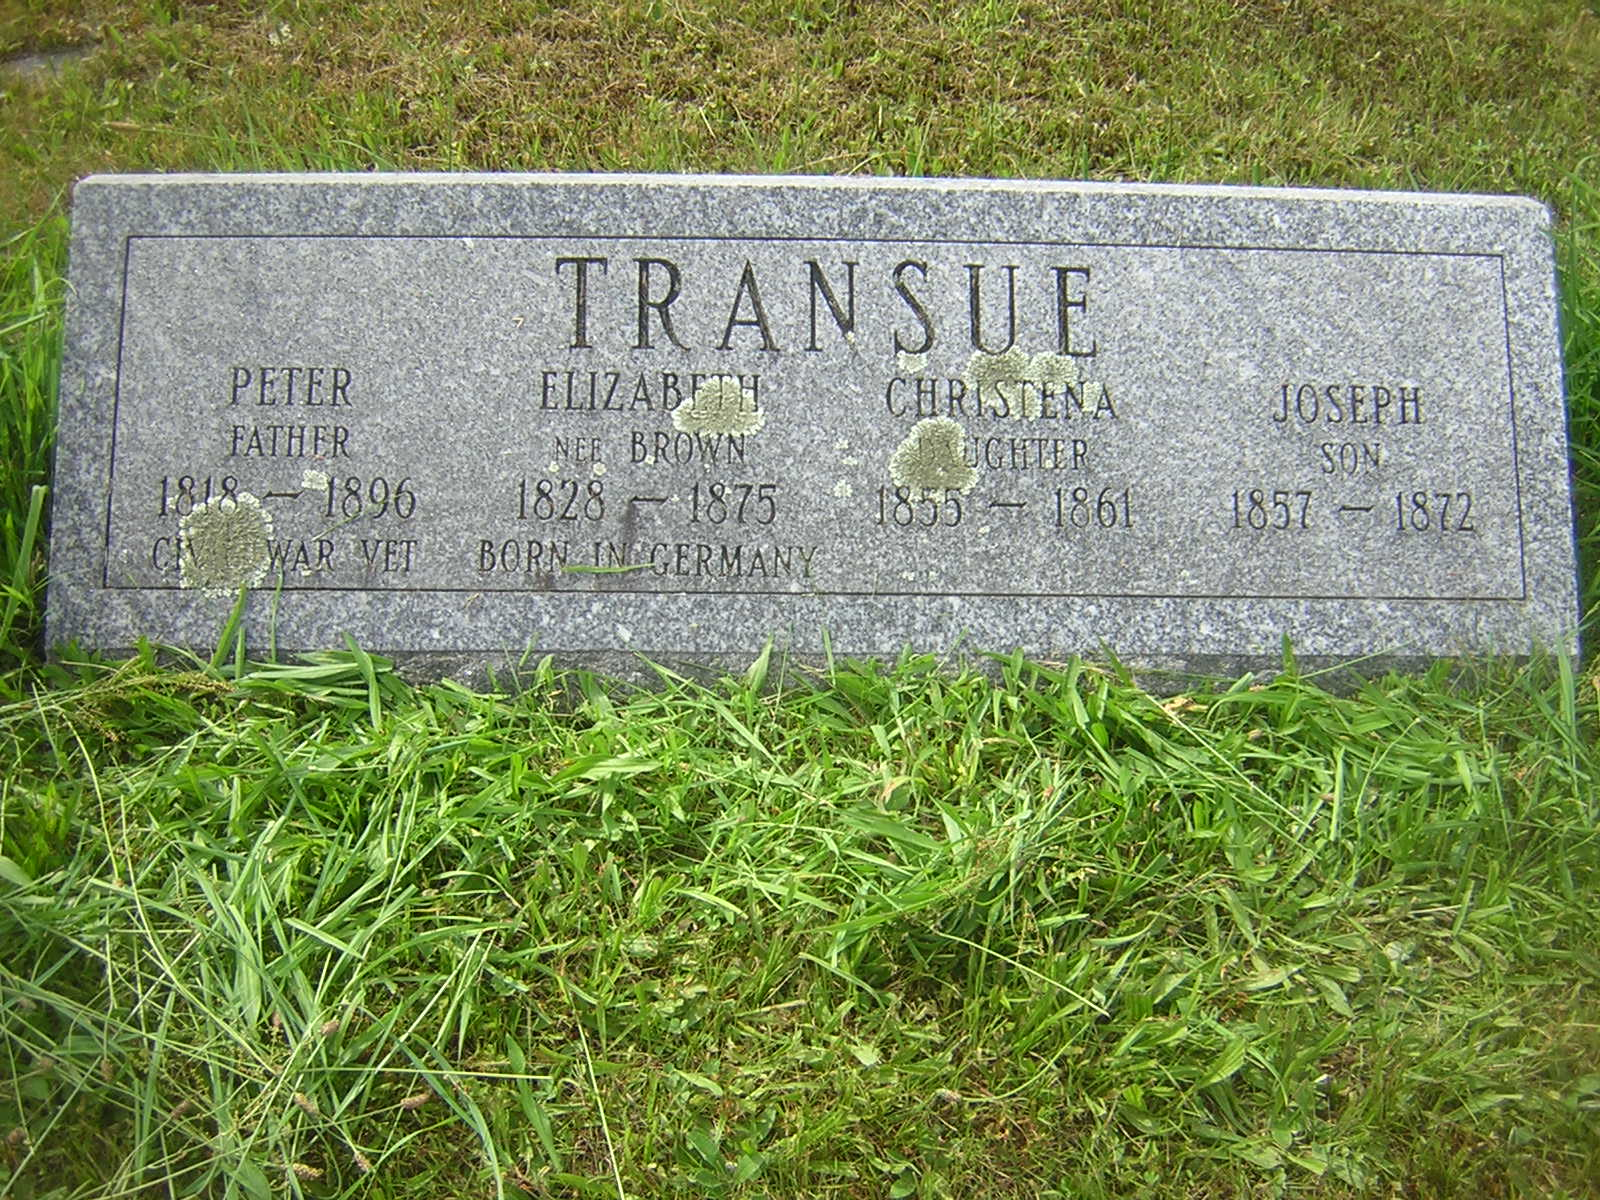 Peter Transue